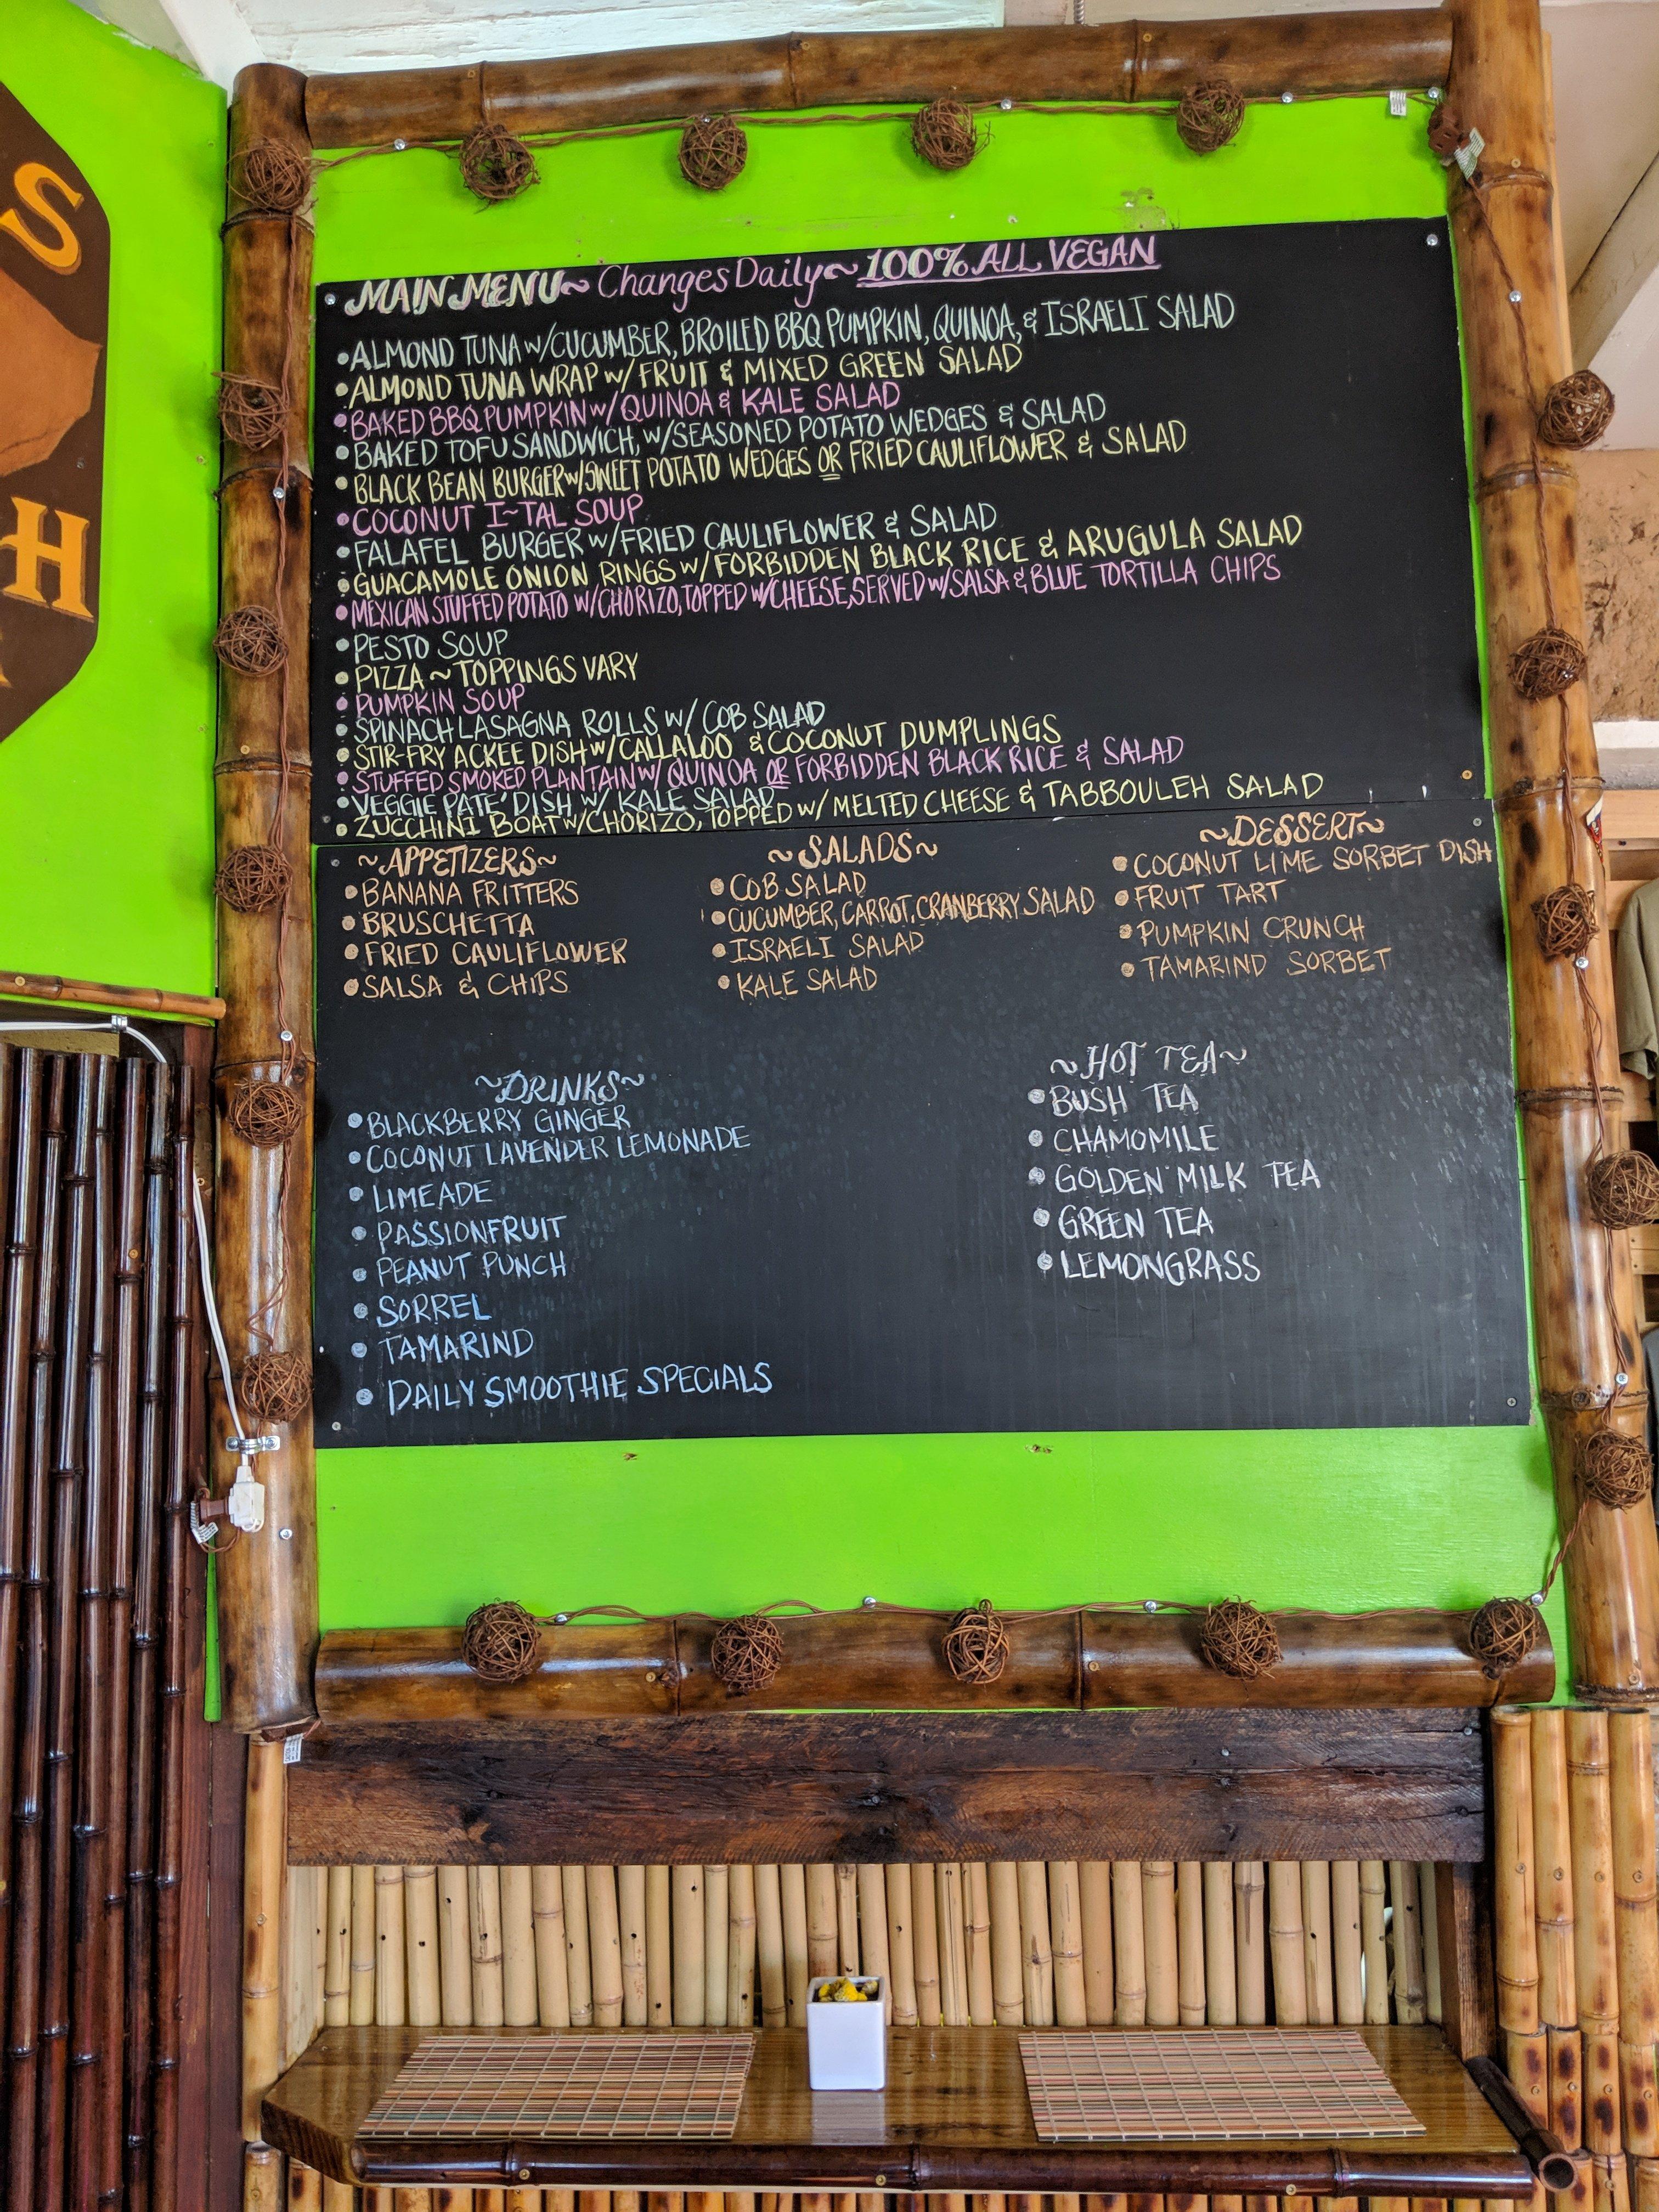 Roots N Kulchah Vegan Restaurant in Fredricksted